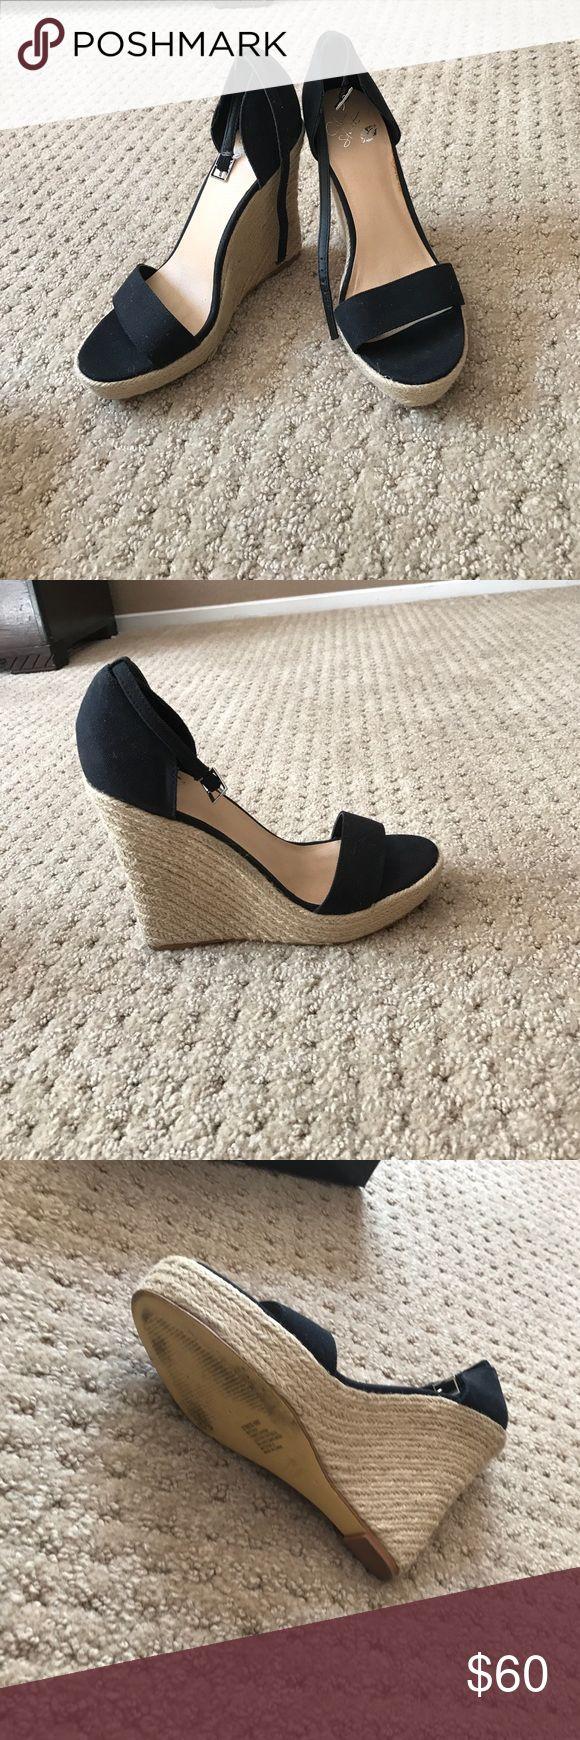 Selling this Black Strap Colin Stuart Wedges on Poshmark! My username is: heathmartinez. #shopmycloset #poshmark #fashion #shopping #style #forsale #Colin Stuart #Shoes